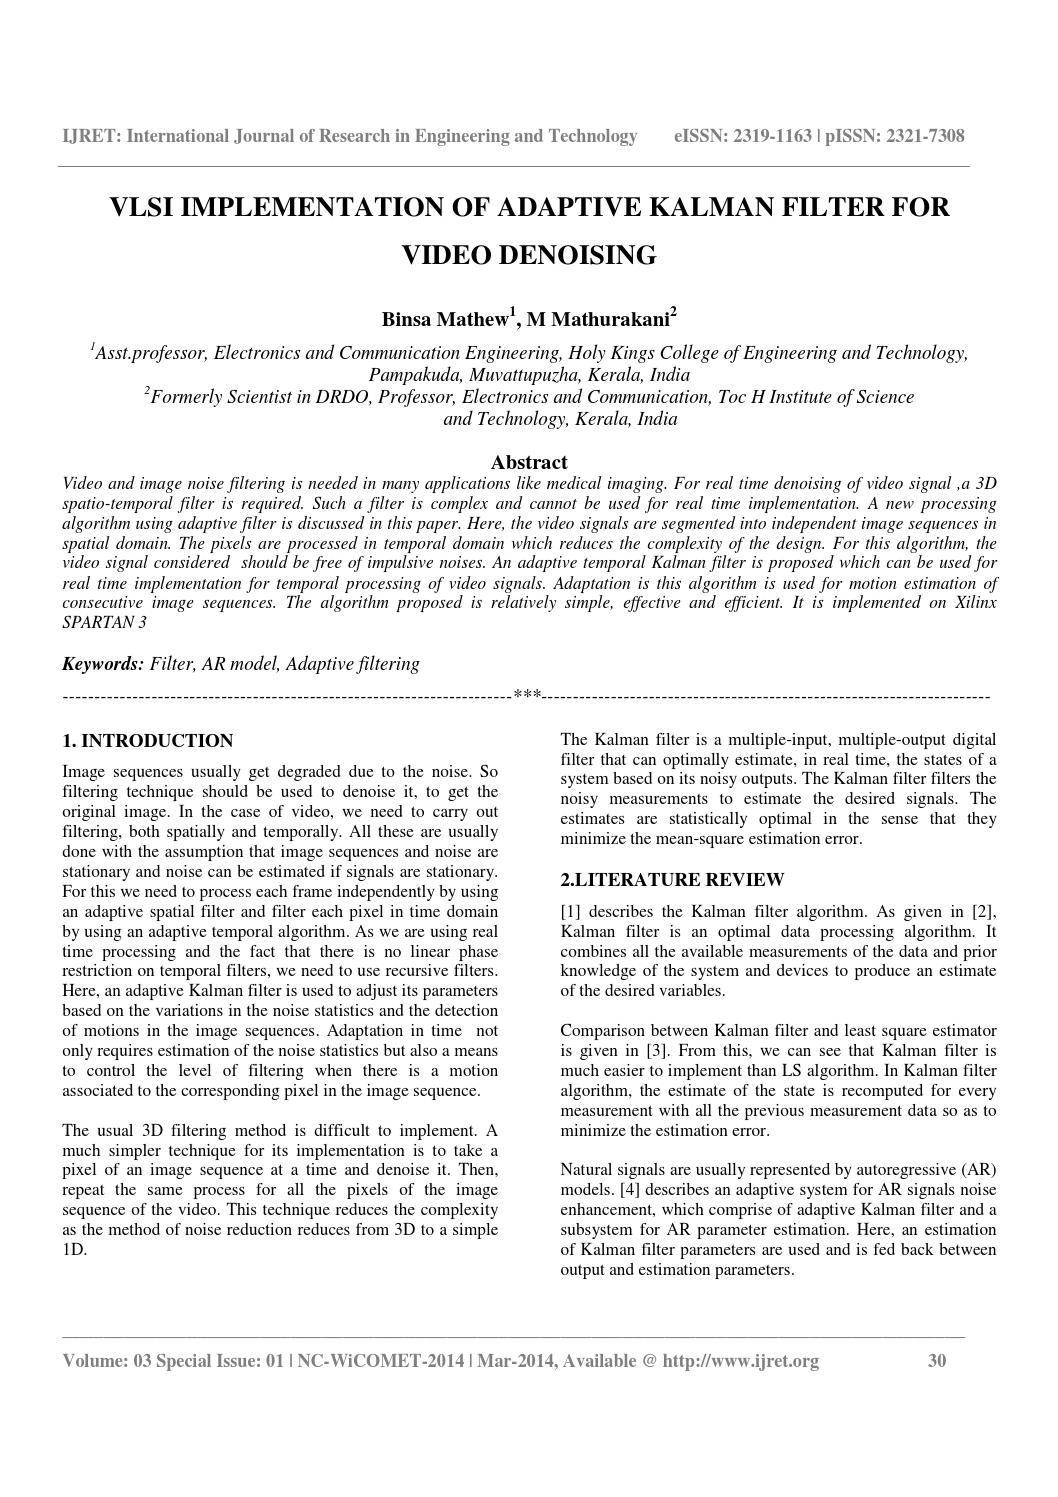 Vlsi implementation of adaptive kalman filter for video